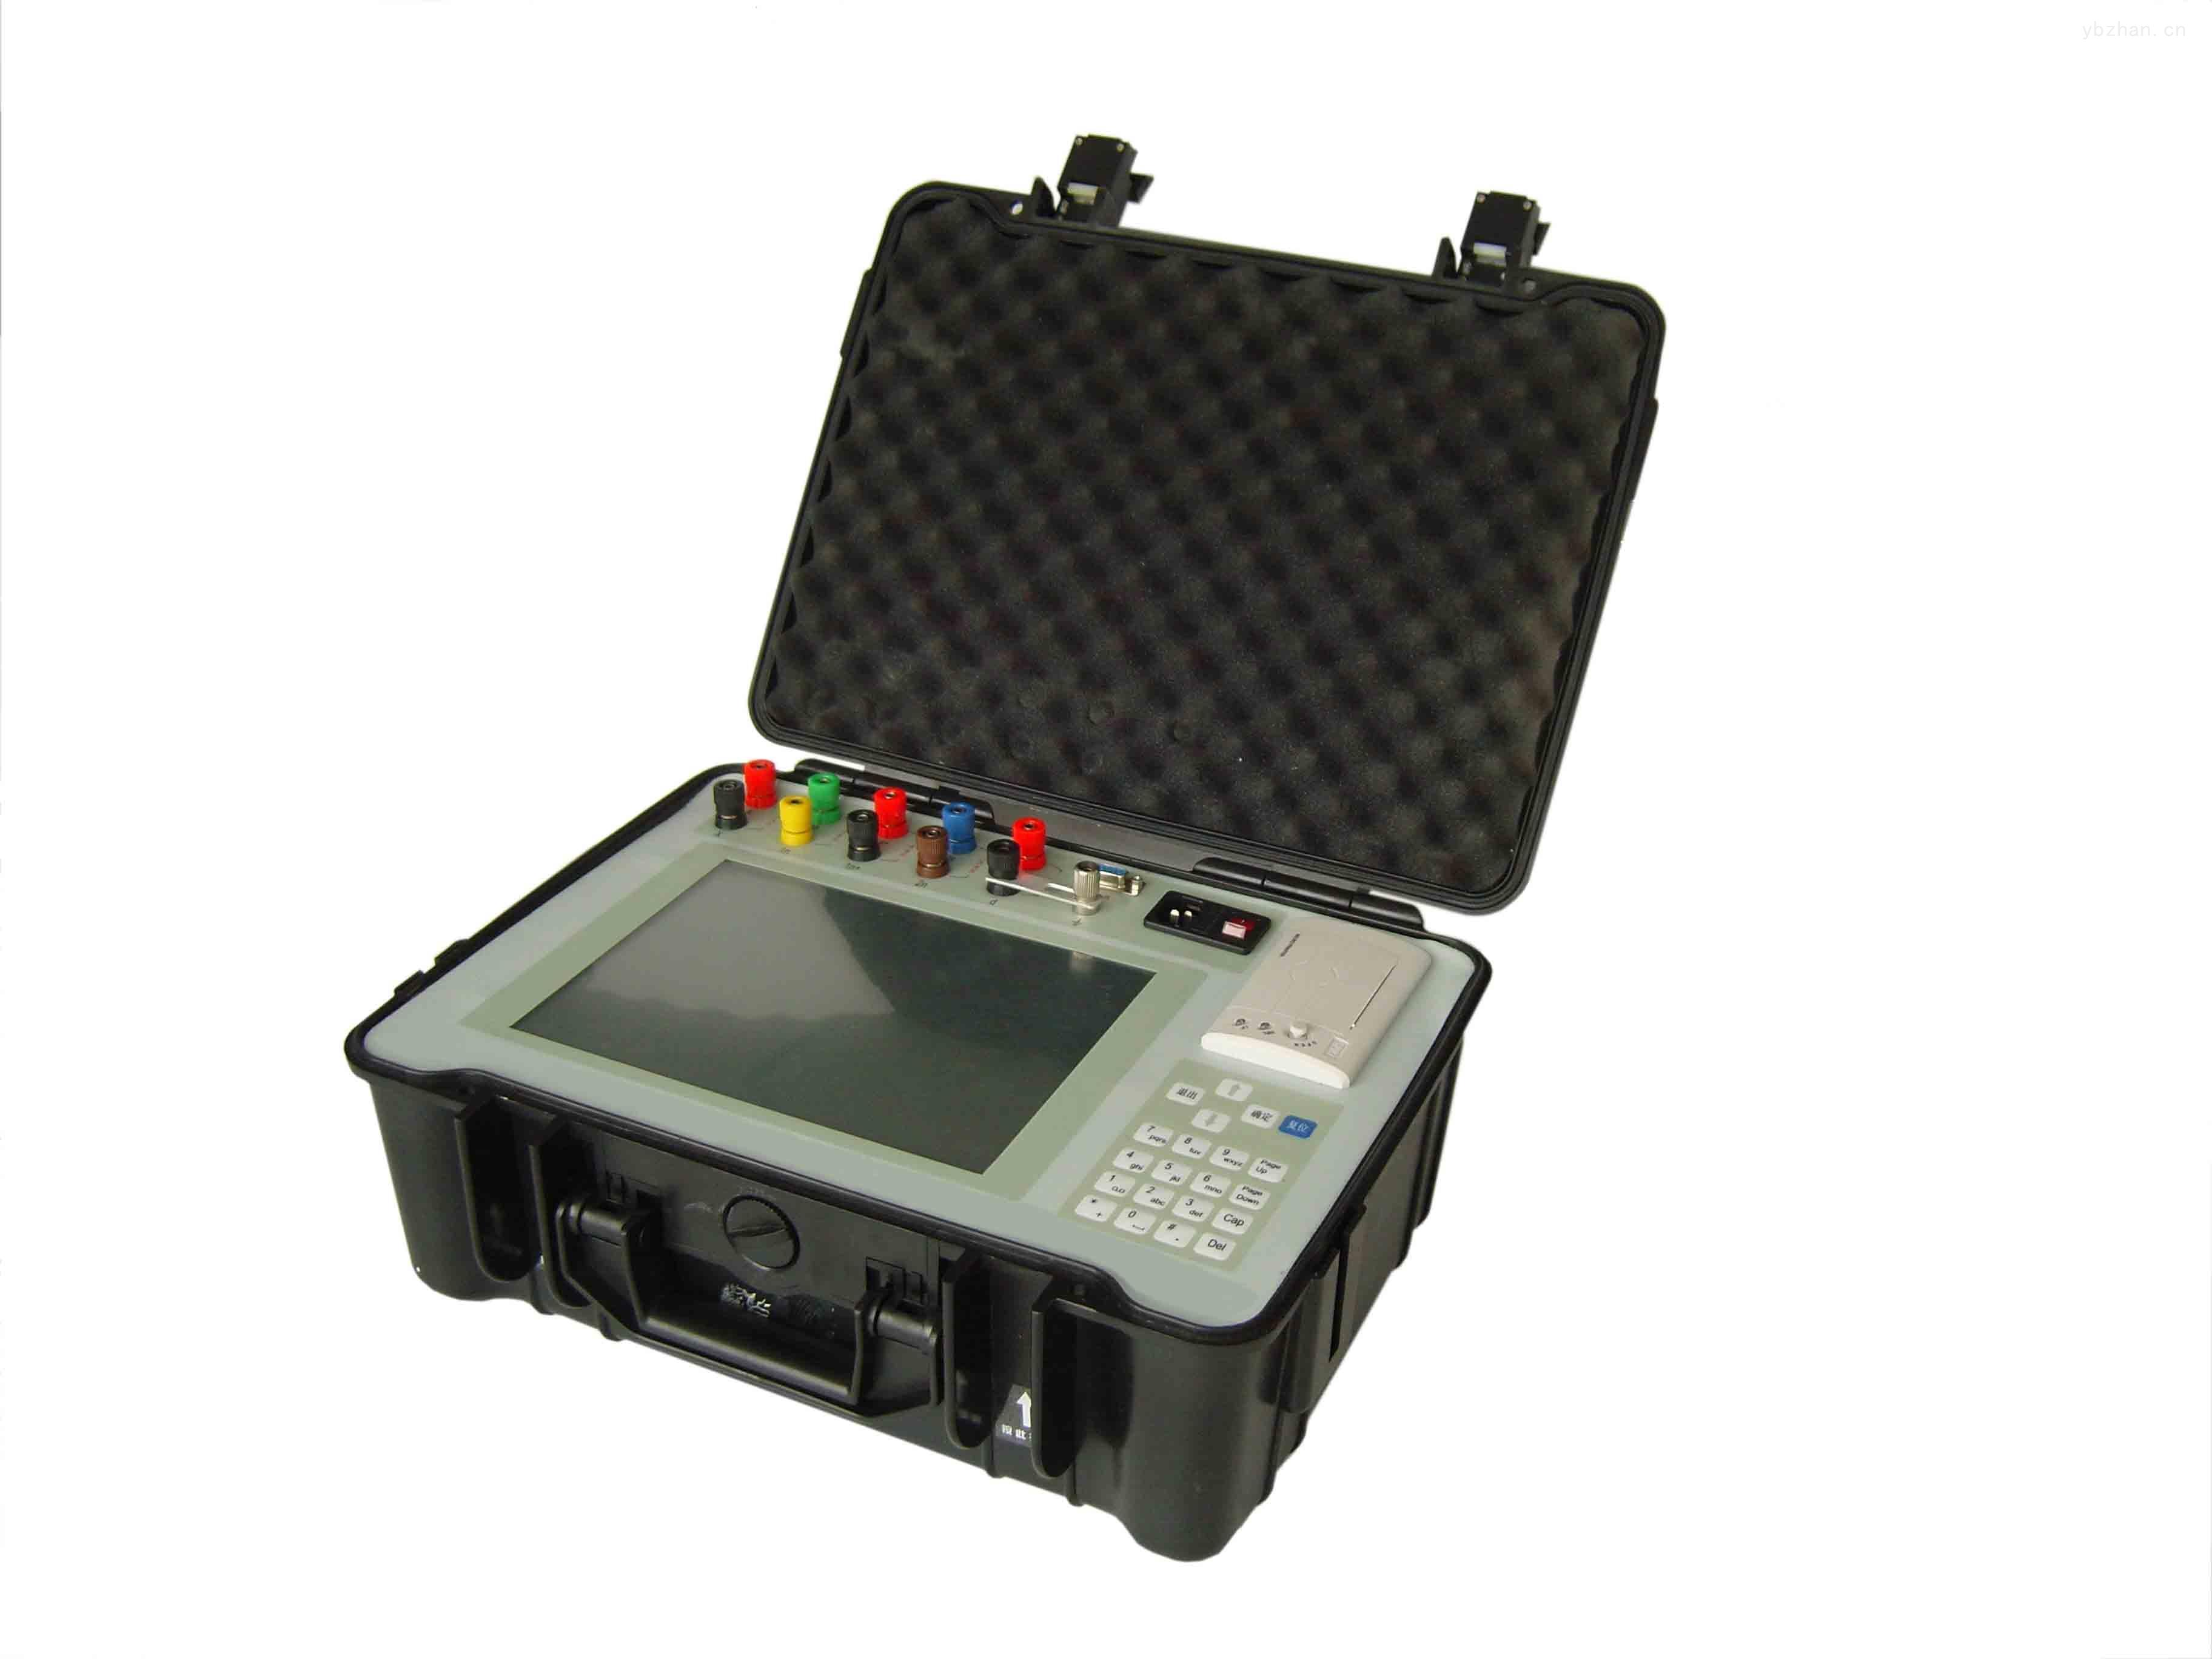 GCCP-103 综合电压电流互感器校驗儀价格